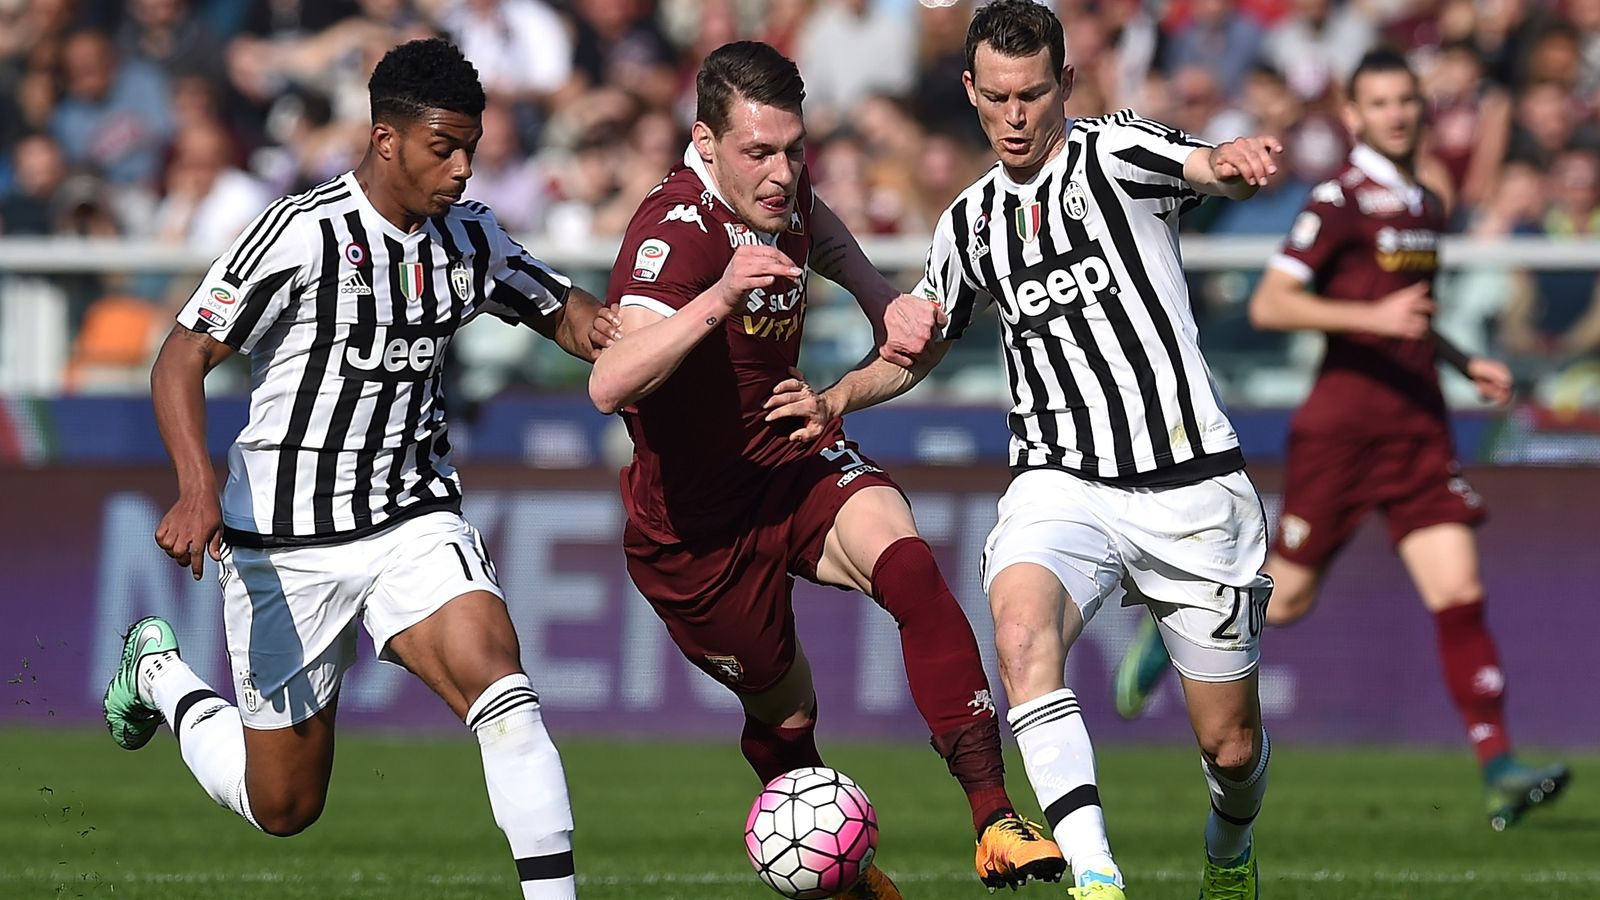 прогноз на 3 апреля 2021. «Торино» — «Ювентус»